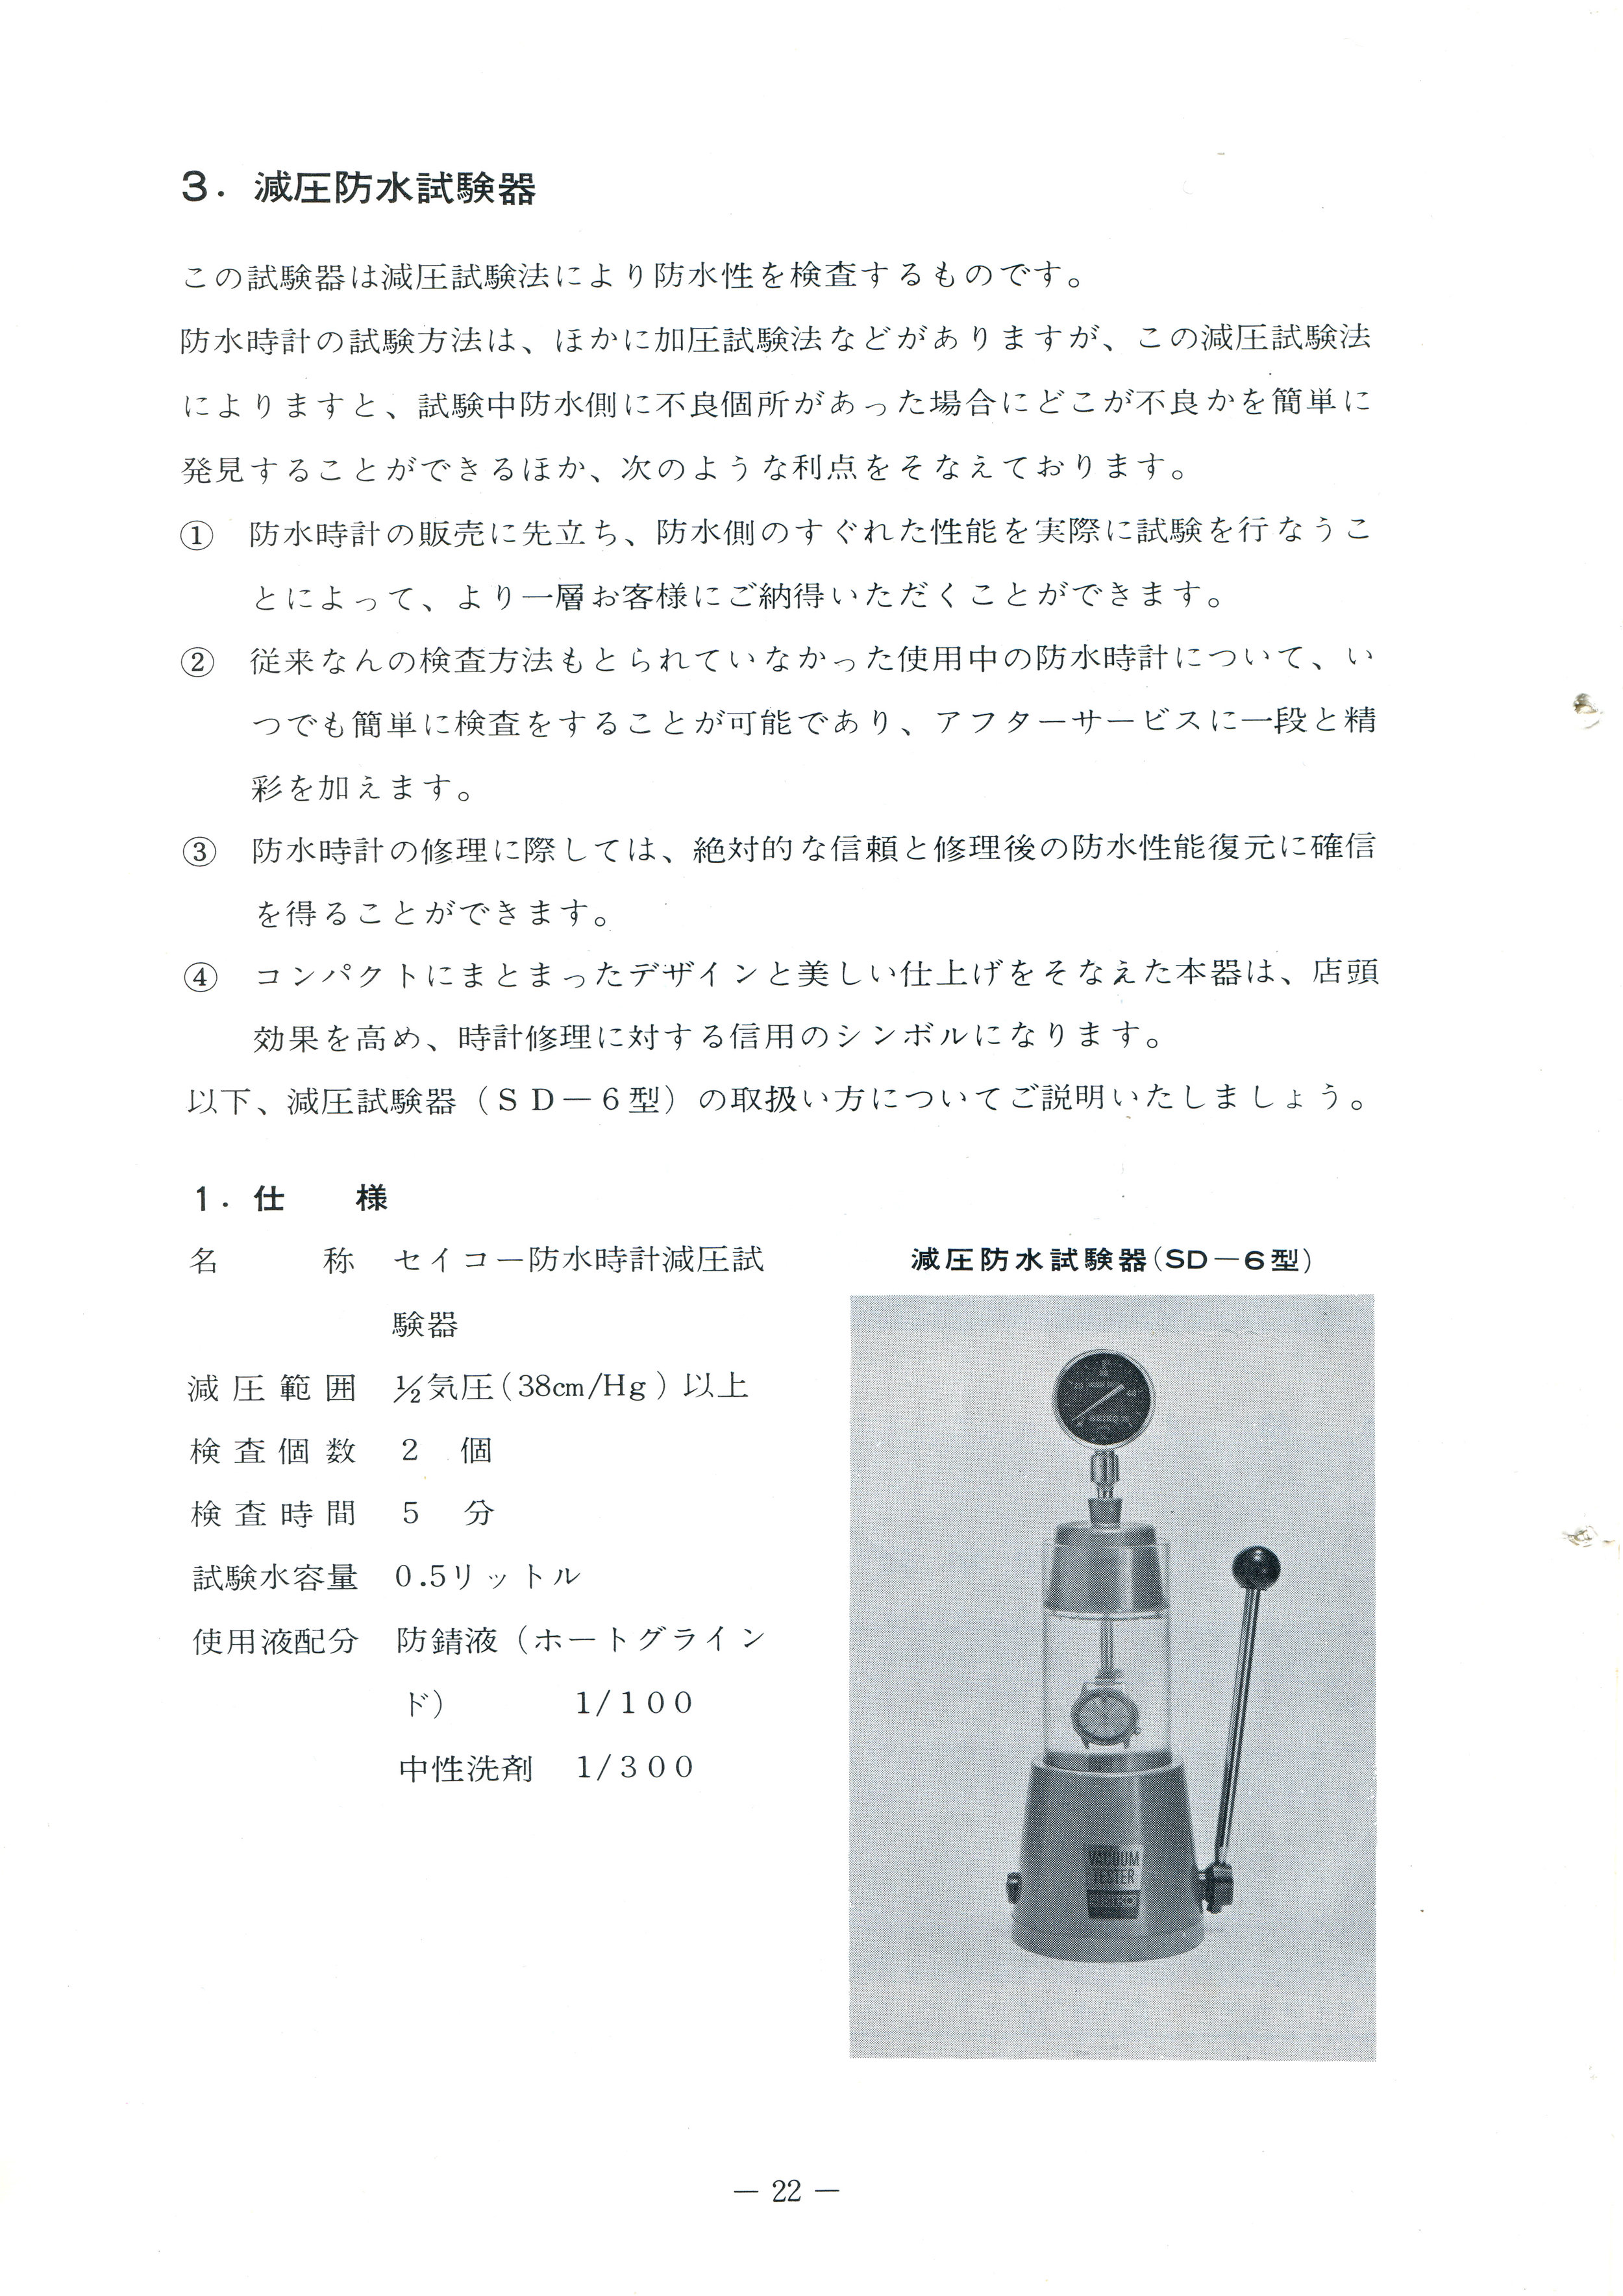 1963 Seiko Technology Notebook - Waterproof (22).jpg